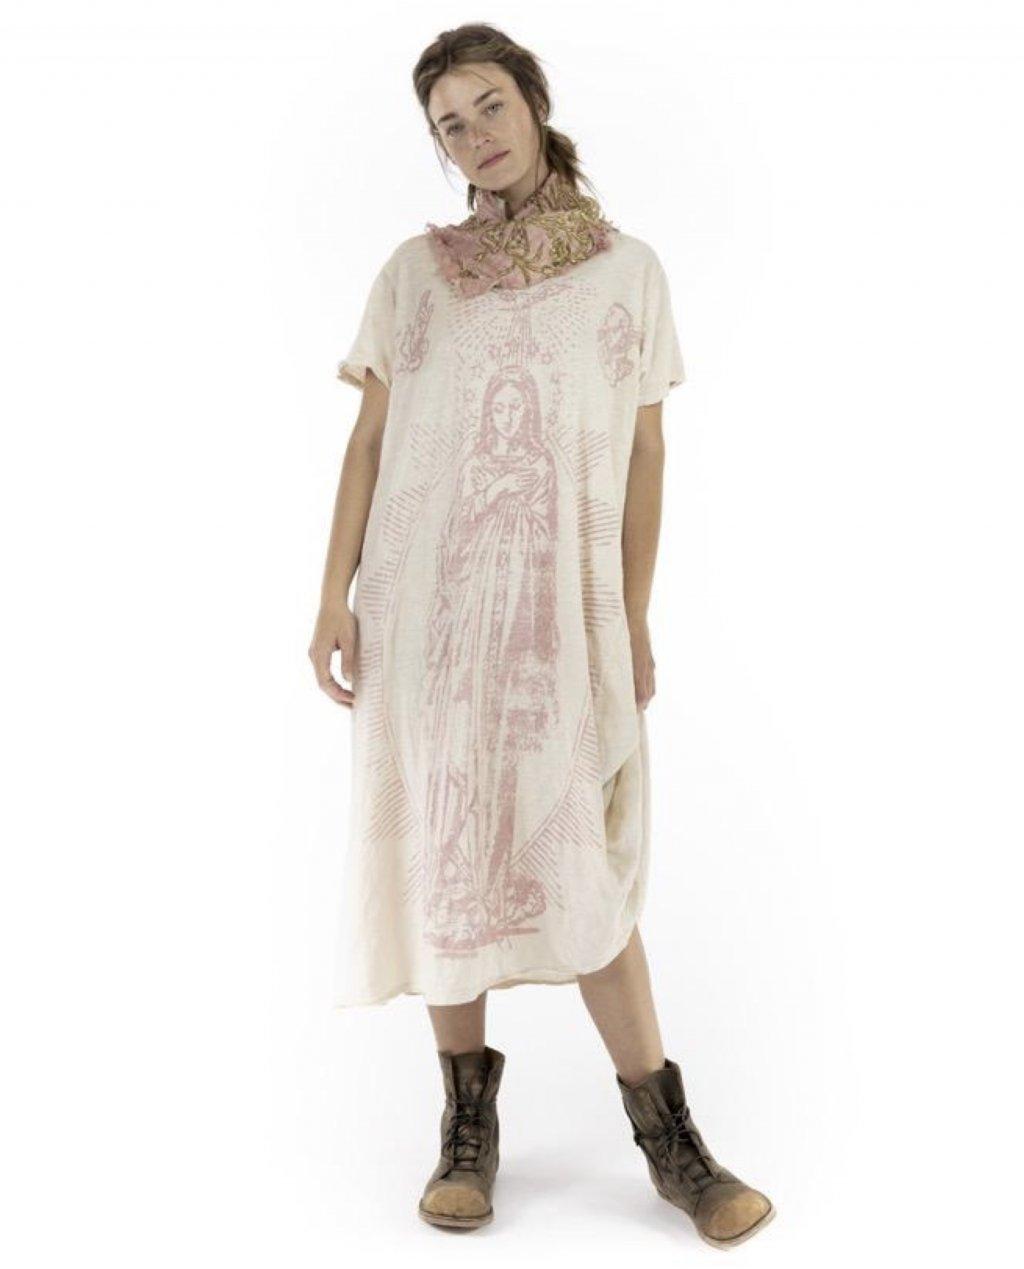 Magnolia Pearl   Cotton Jersey Mary of Prosperity T Dress   Petal